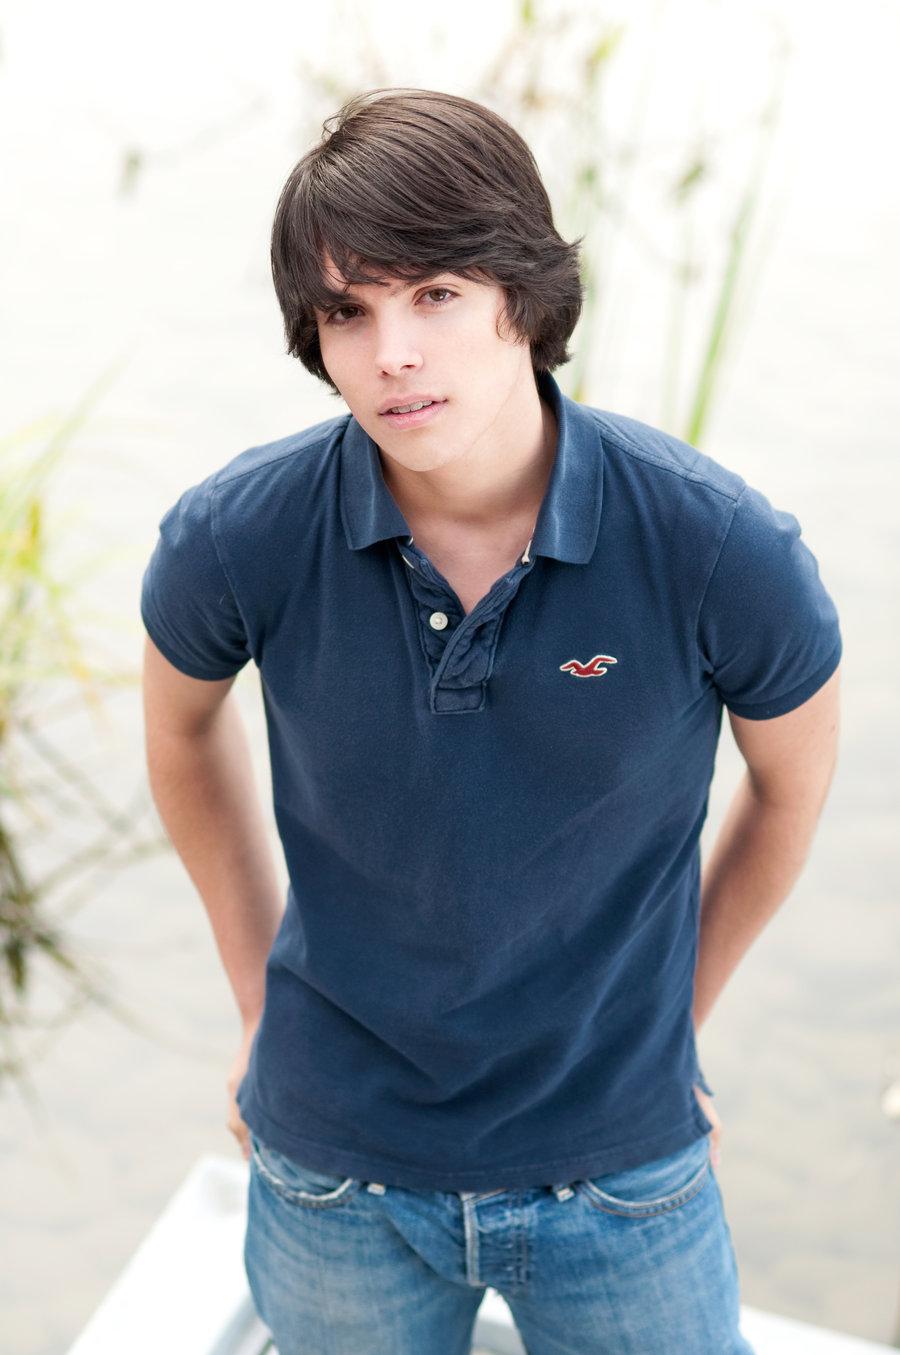 HANDSOME BOYS CLUB: Shirtless Handsome Boy Teenagers